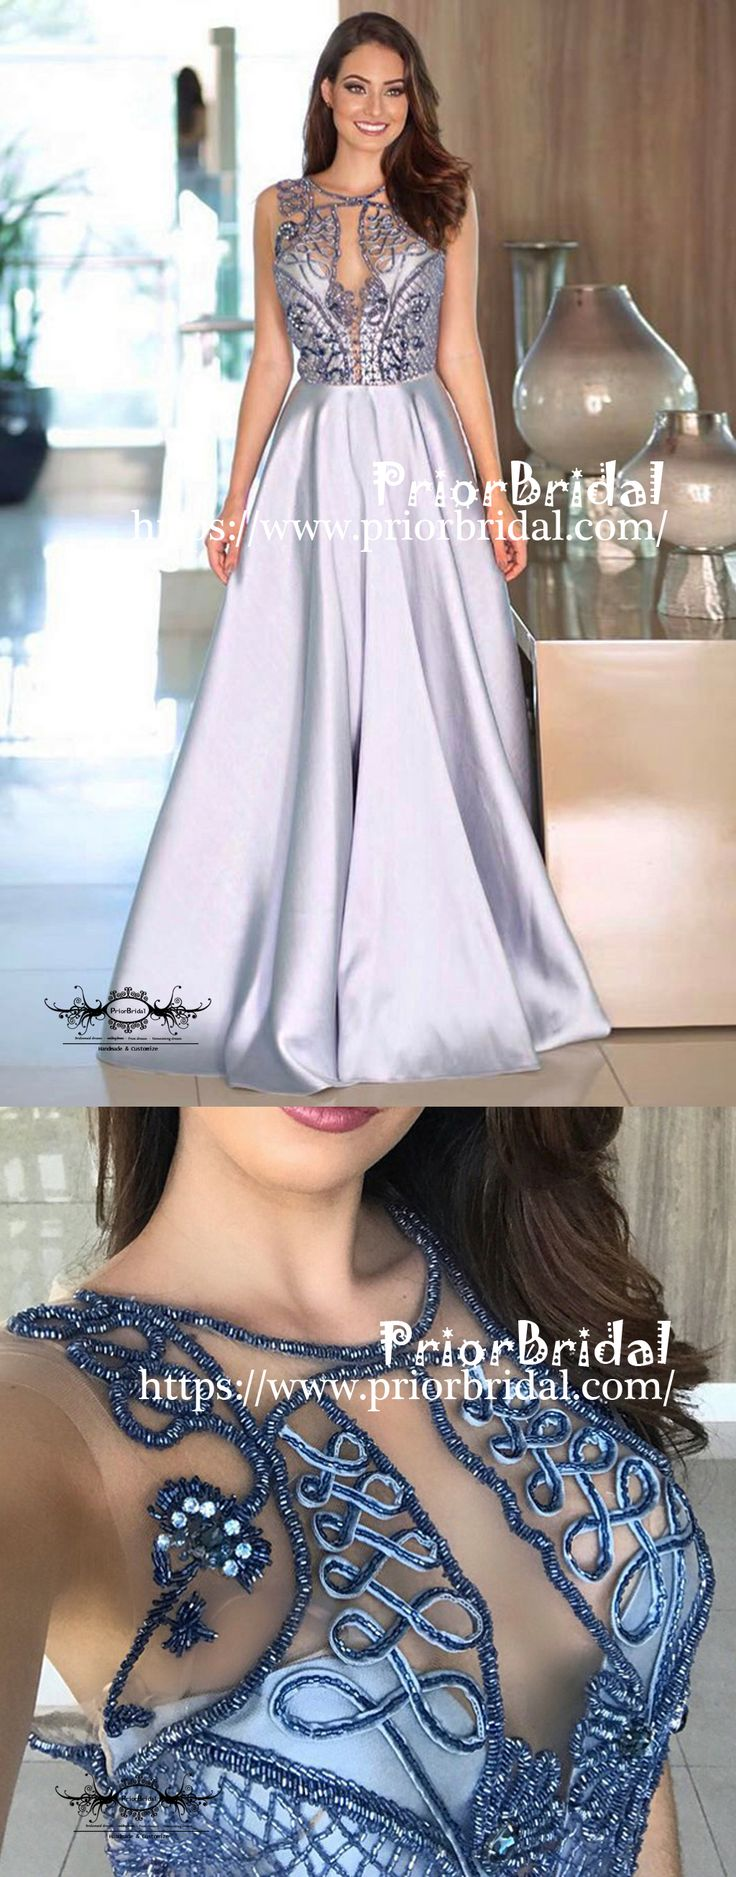 Elegant Beaded See Through Top Round Neck Sleeveless Prom Dresses,PB1042